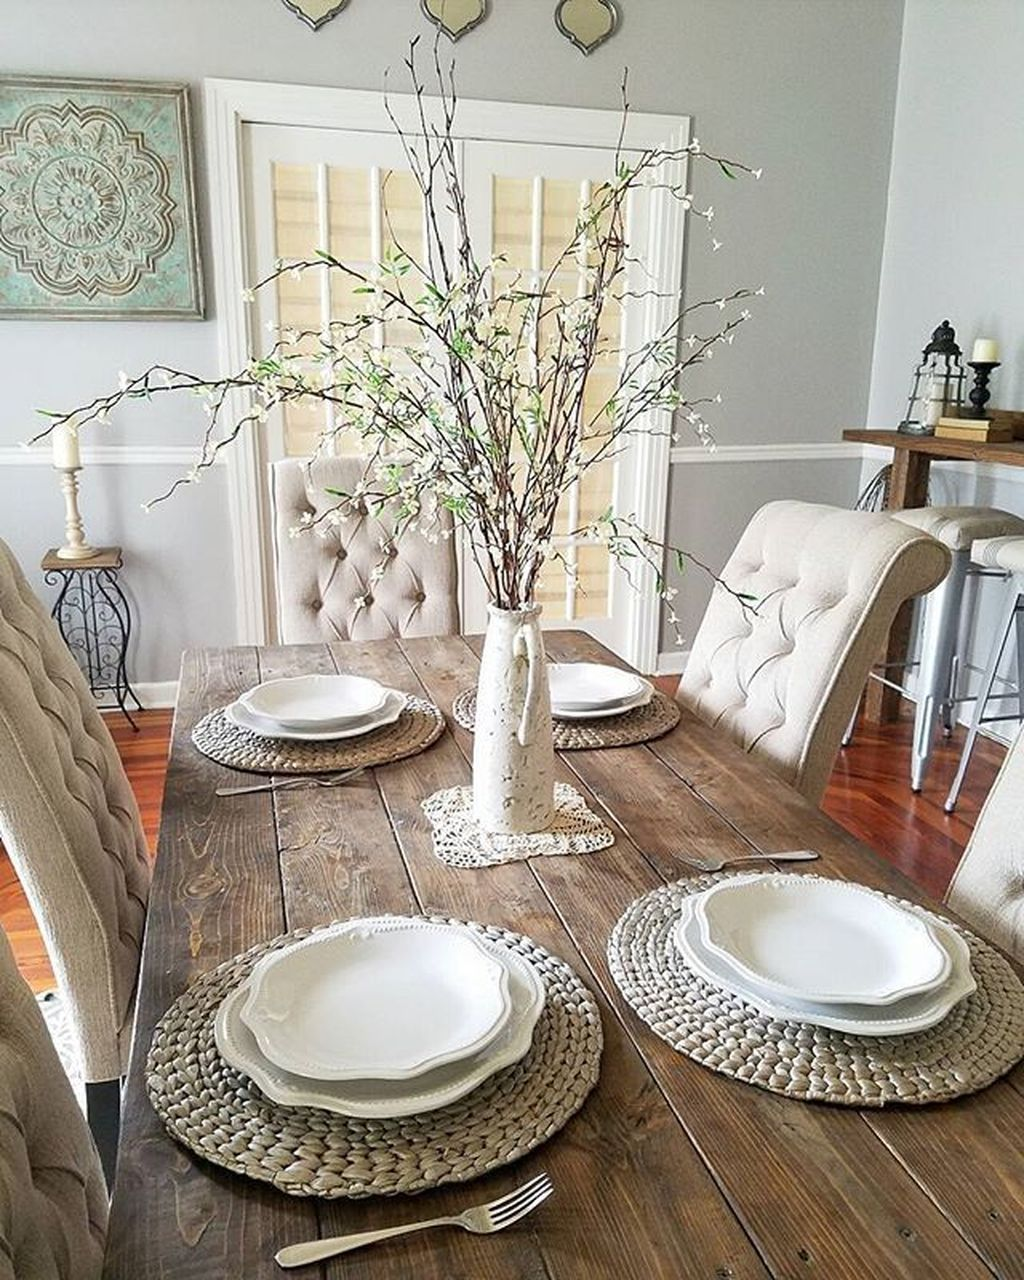 44 elegant farmhouse tables decoration ideas furniture farmhouse rh pinterest com